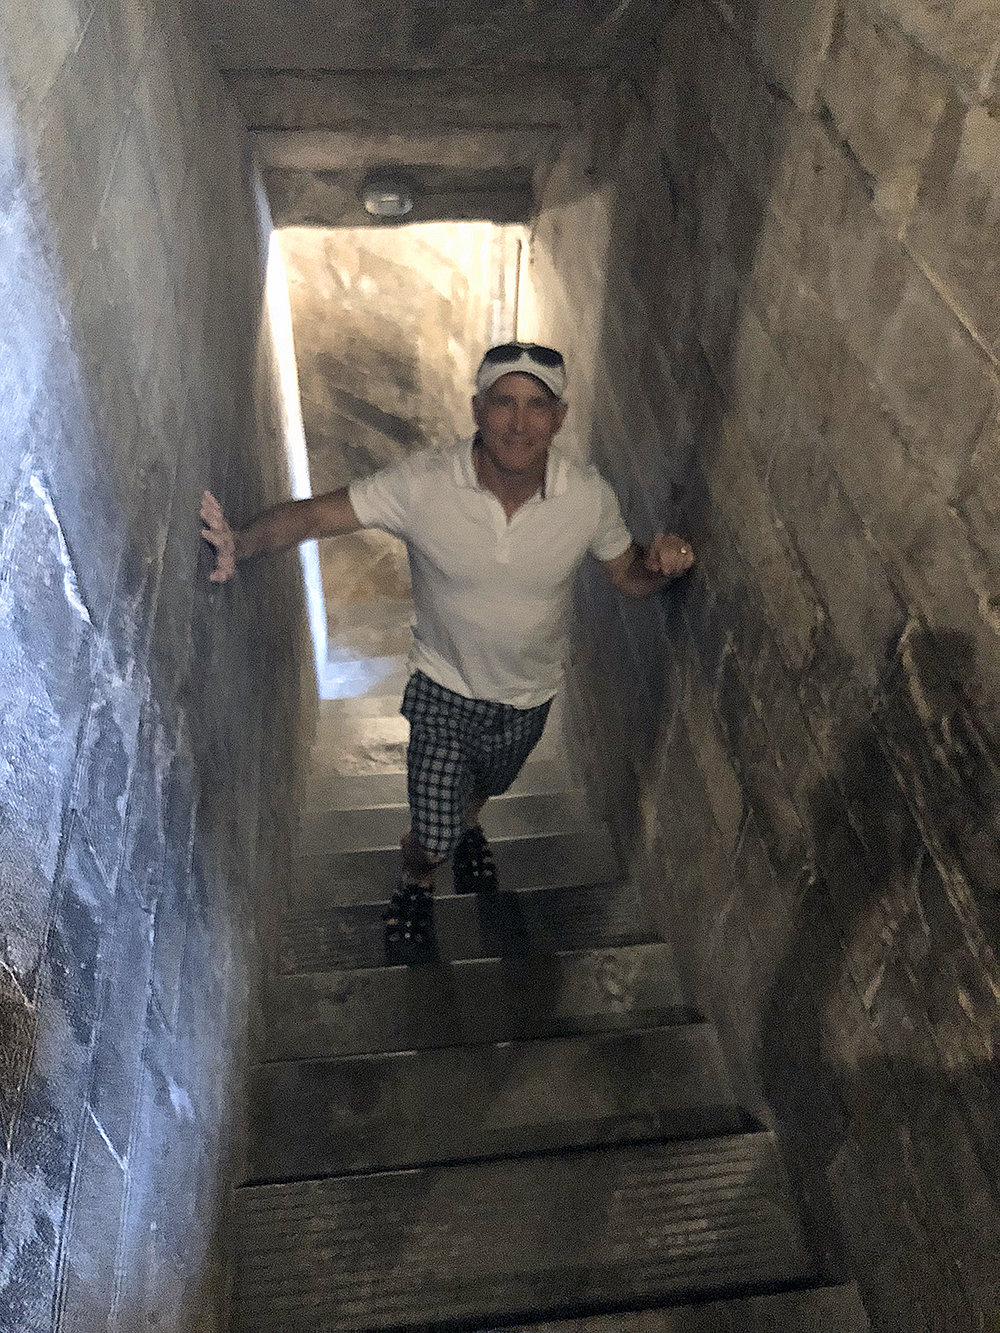 2018 ITALY_firenze_duomo steps_david.jpg